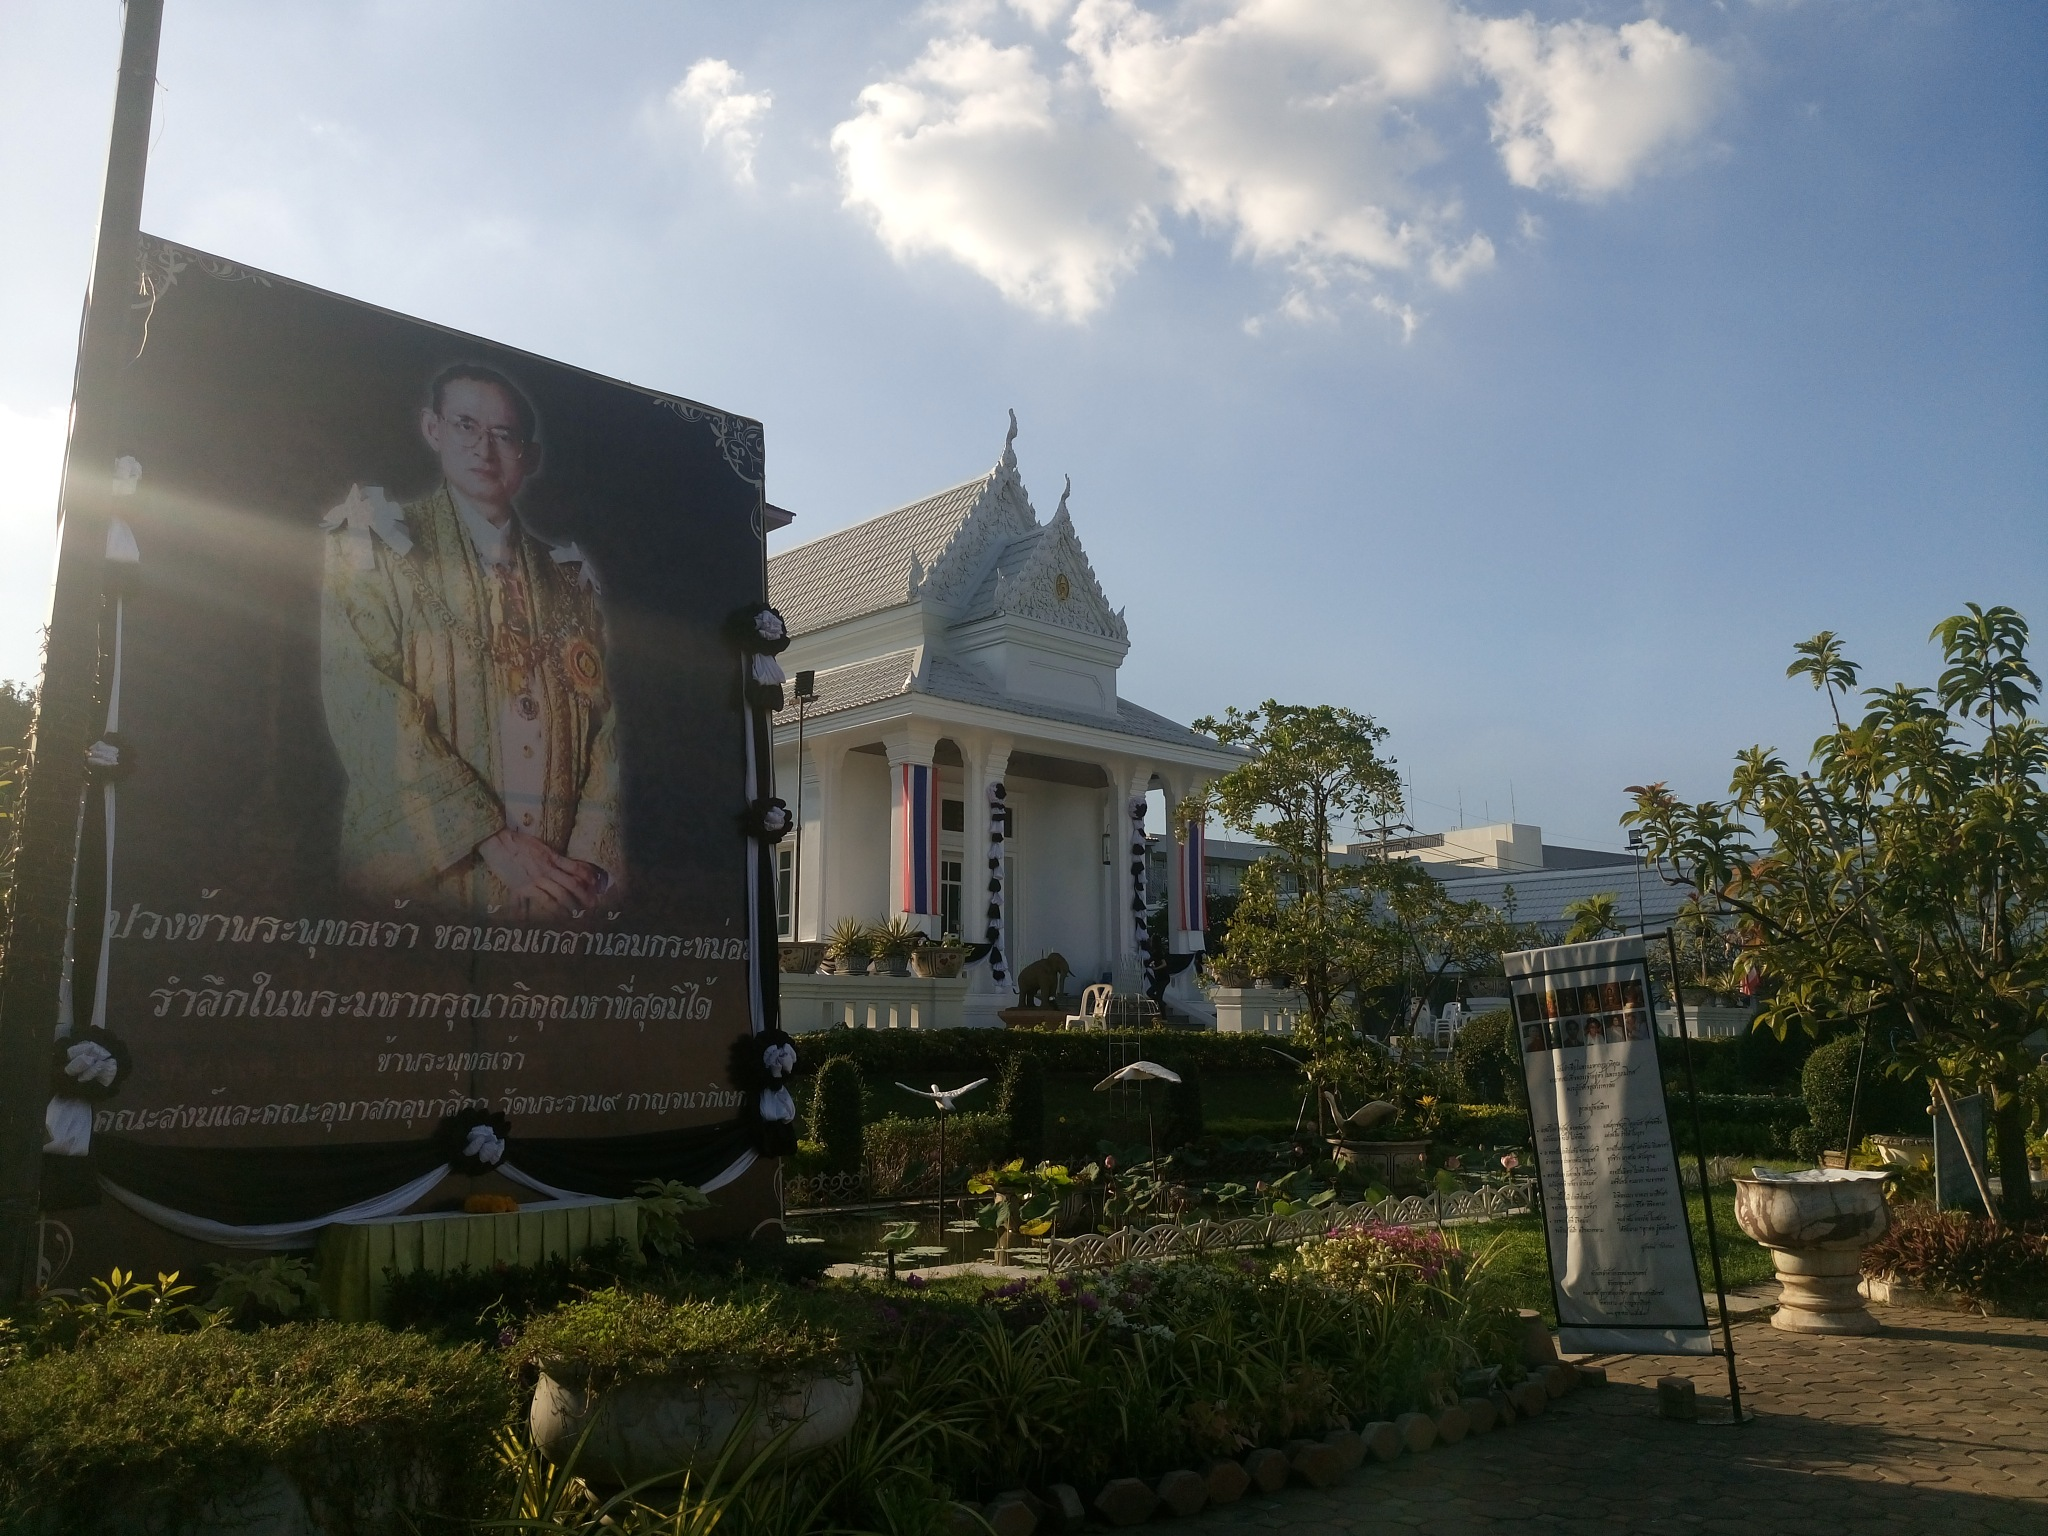 Praram 9 Kanchanapisek Temple by SolomonEz